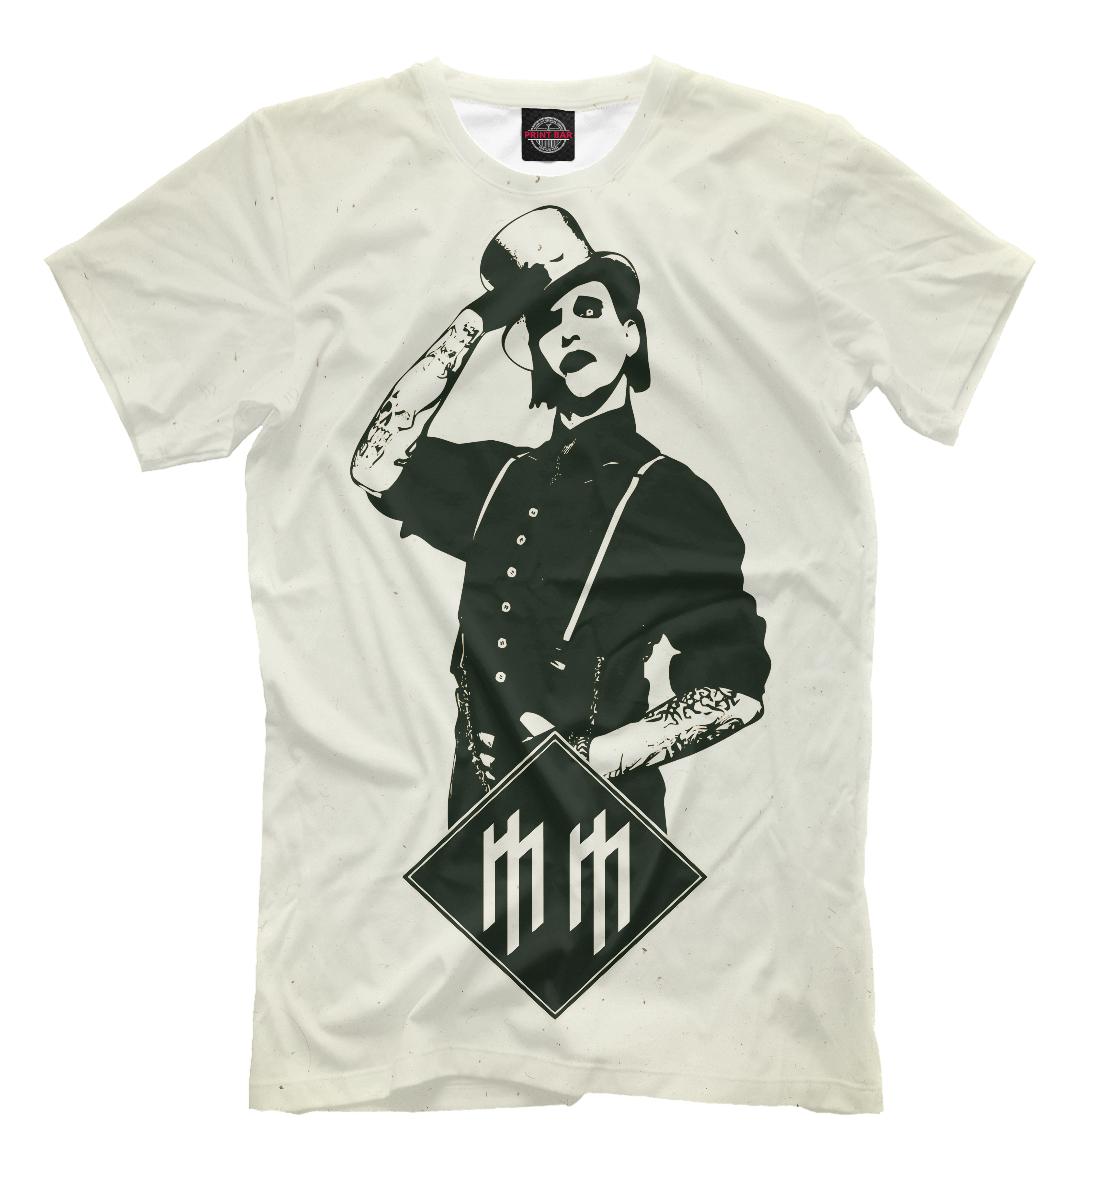 Купить Marilyn Manson, Printbar, Футболки, MRM-132415-fut-2